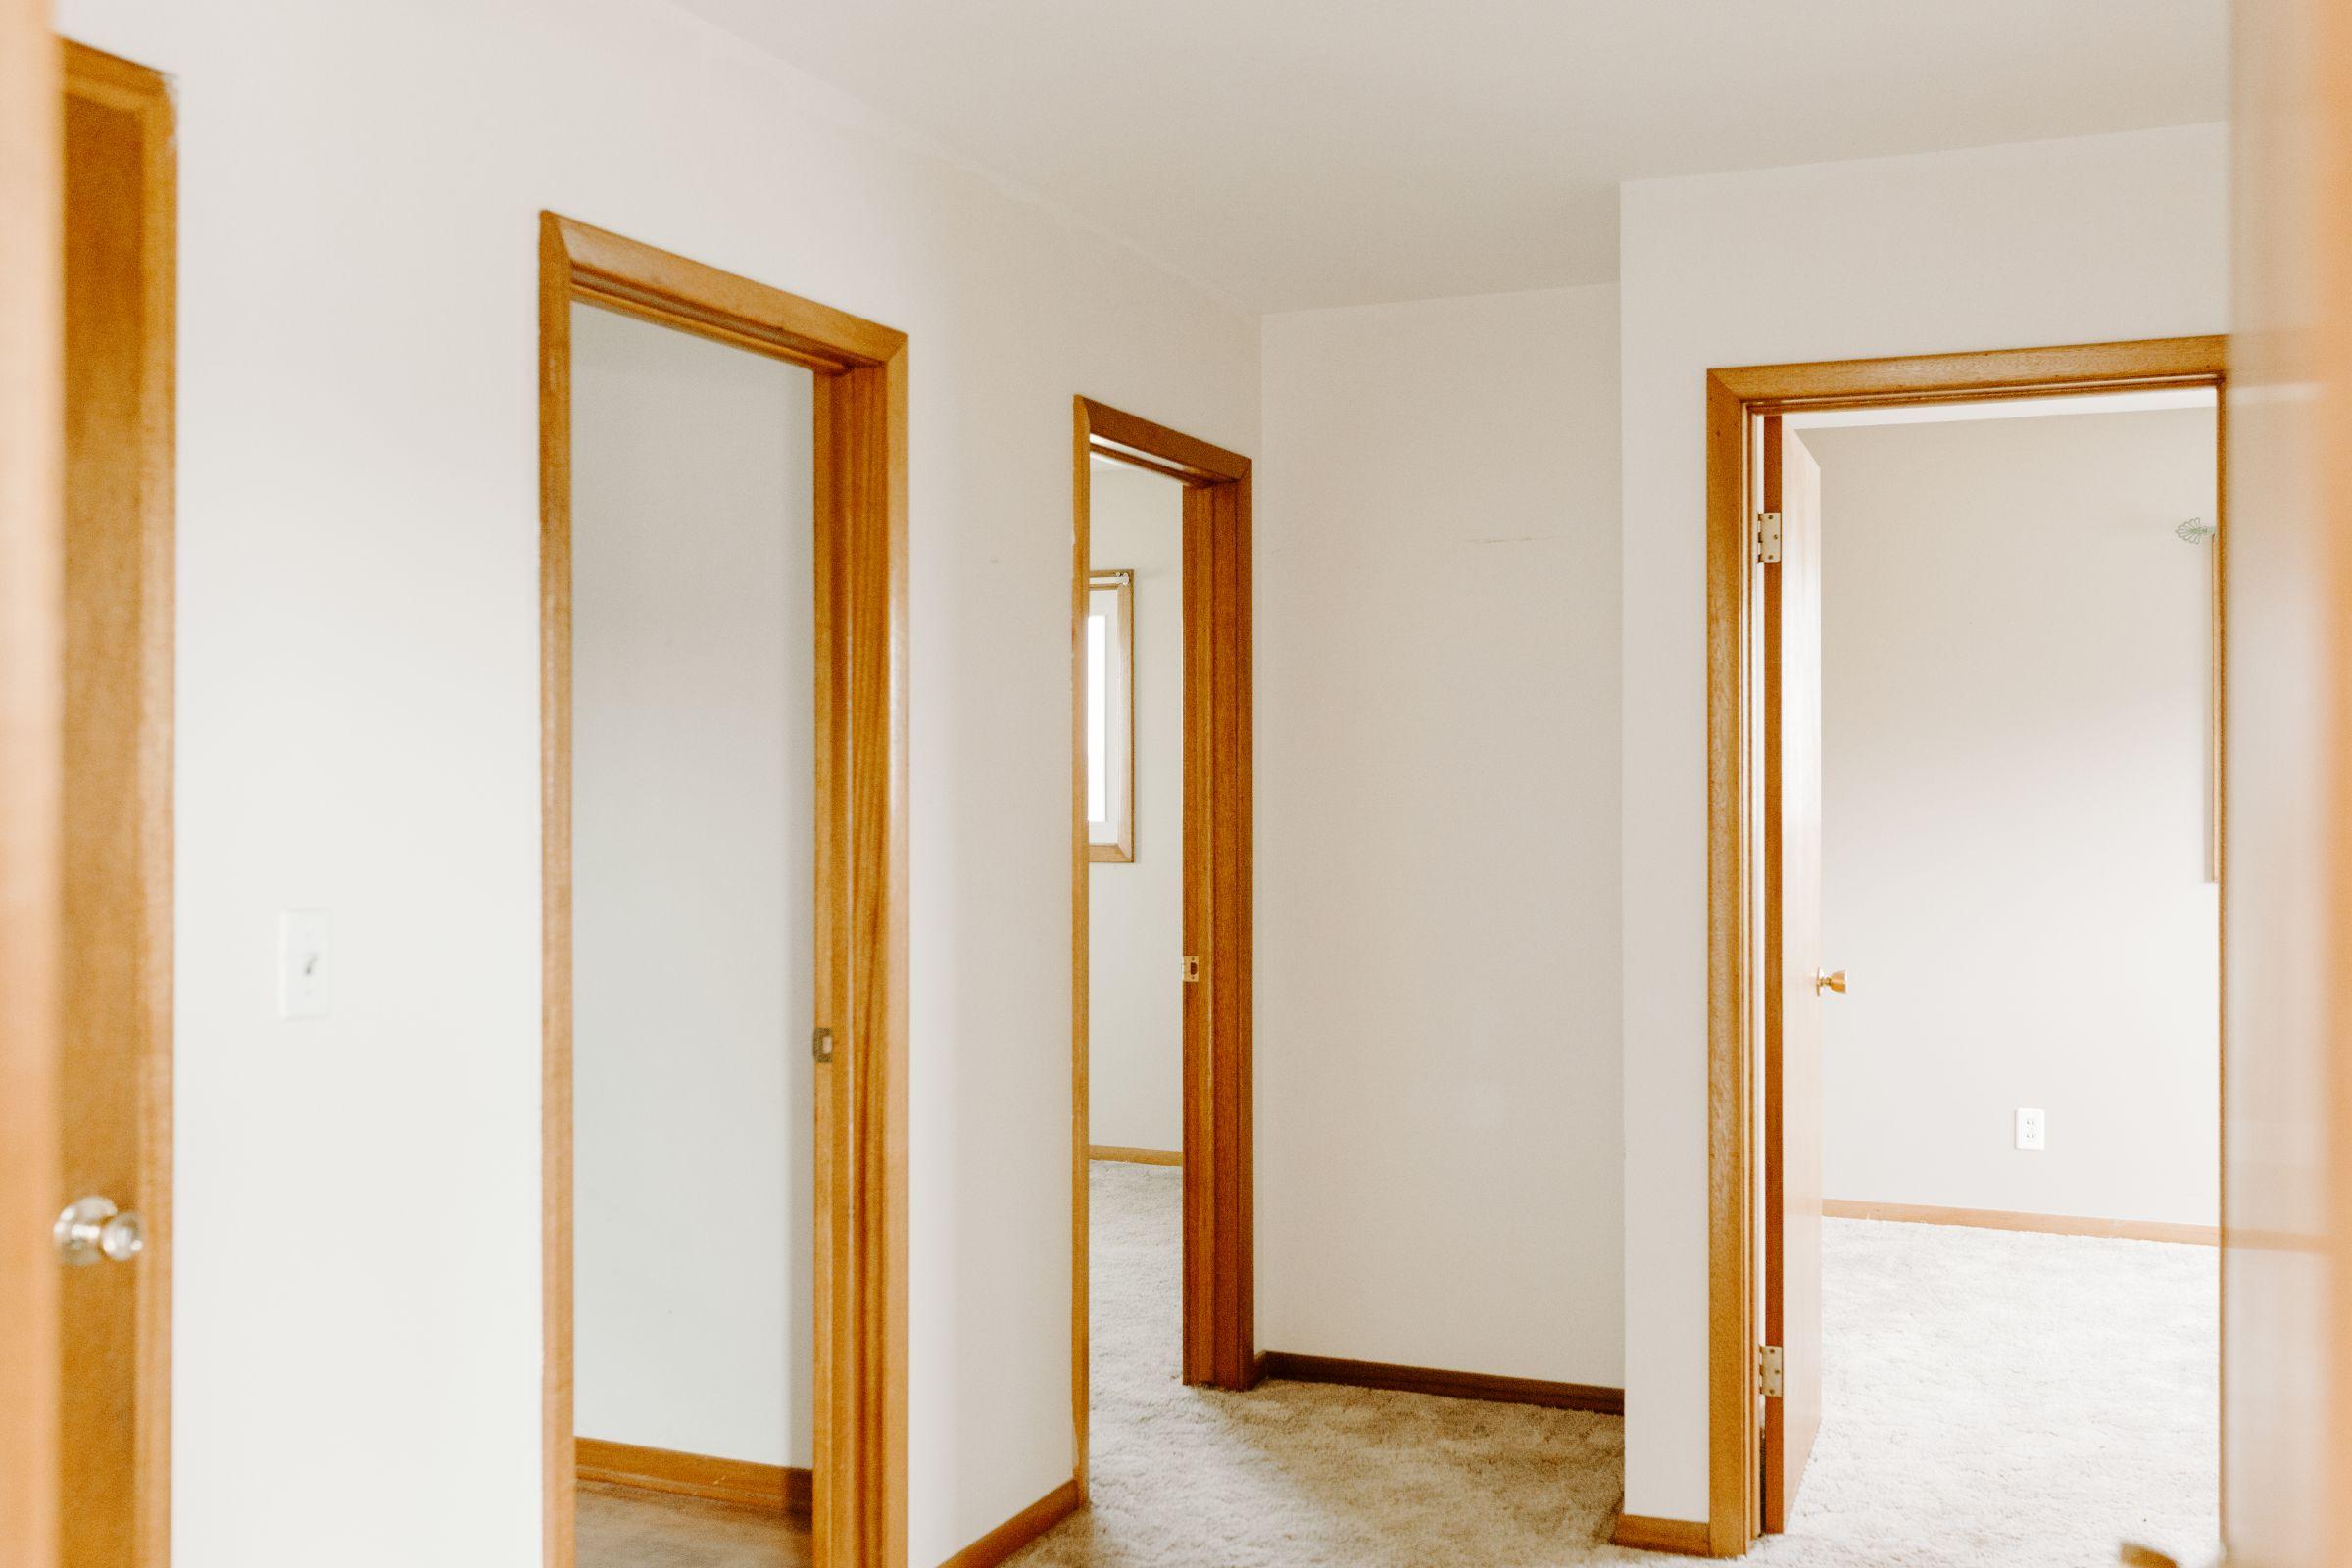 residential-warren-county-iowa-2-acres-listing-number-15743-2-2021-09-15-195935.jpg